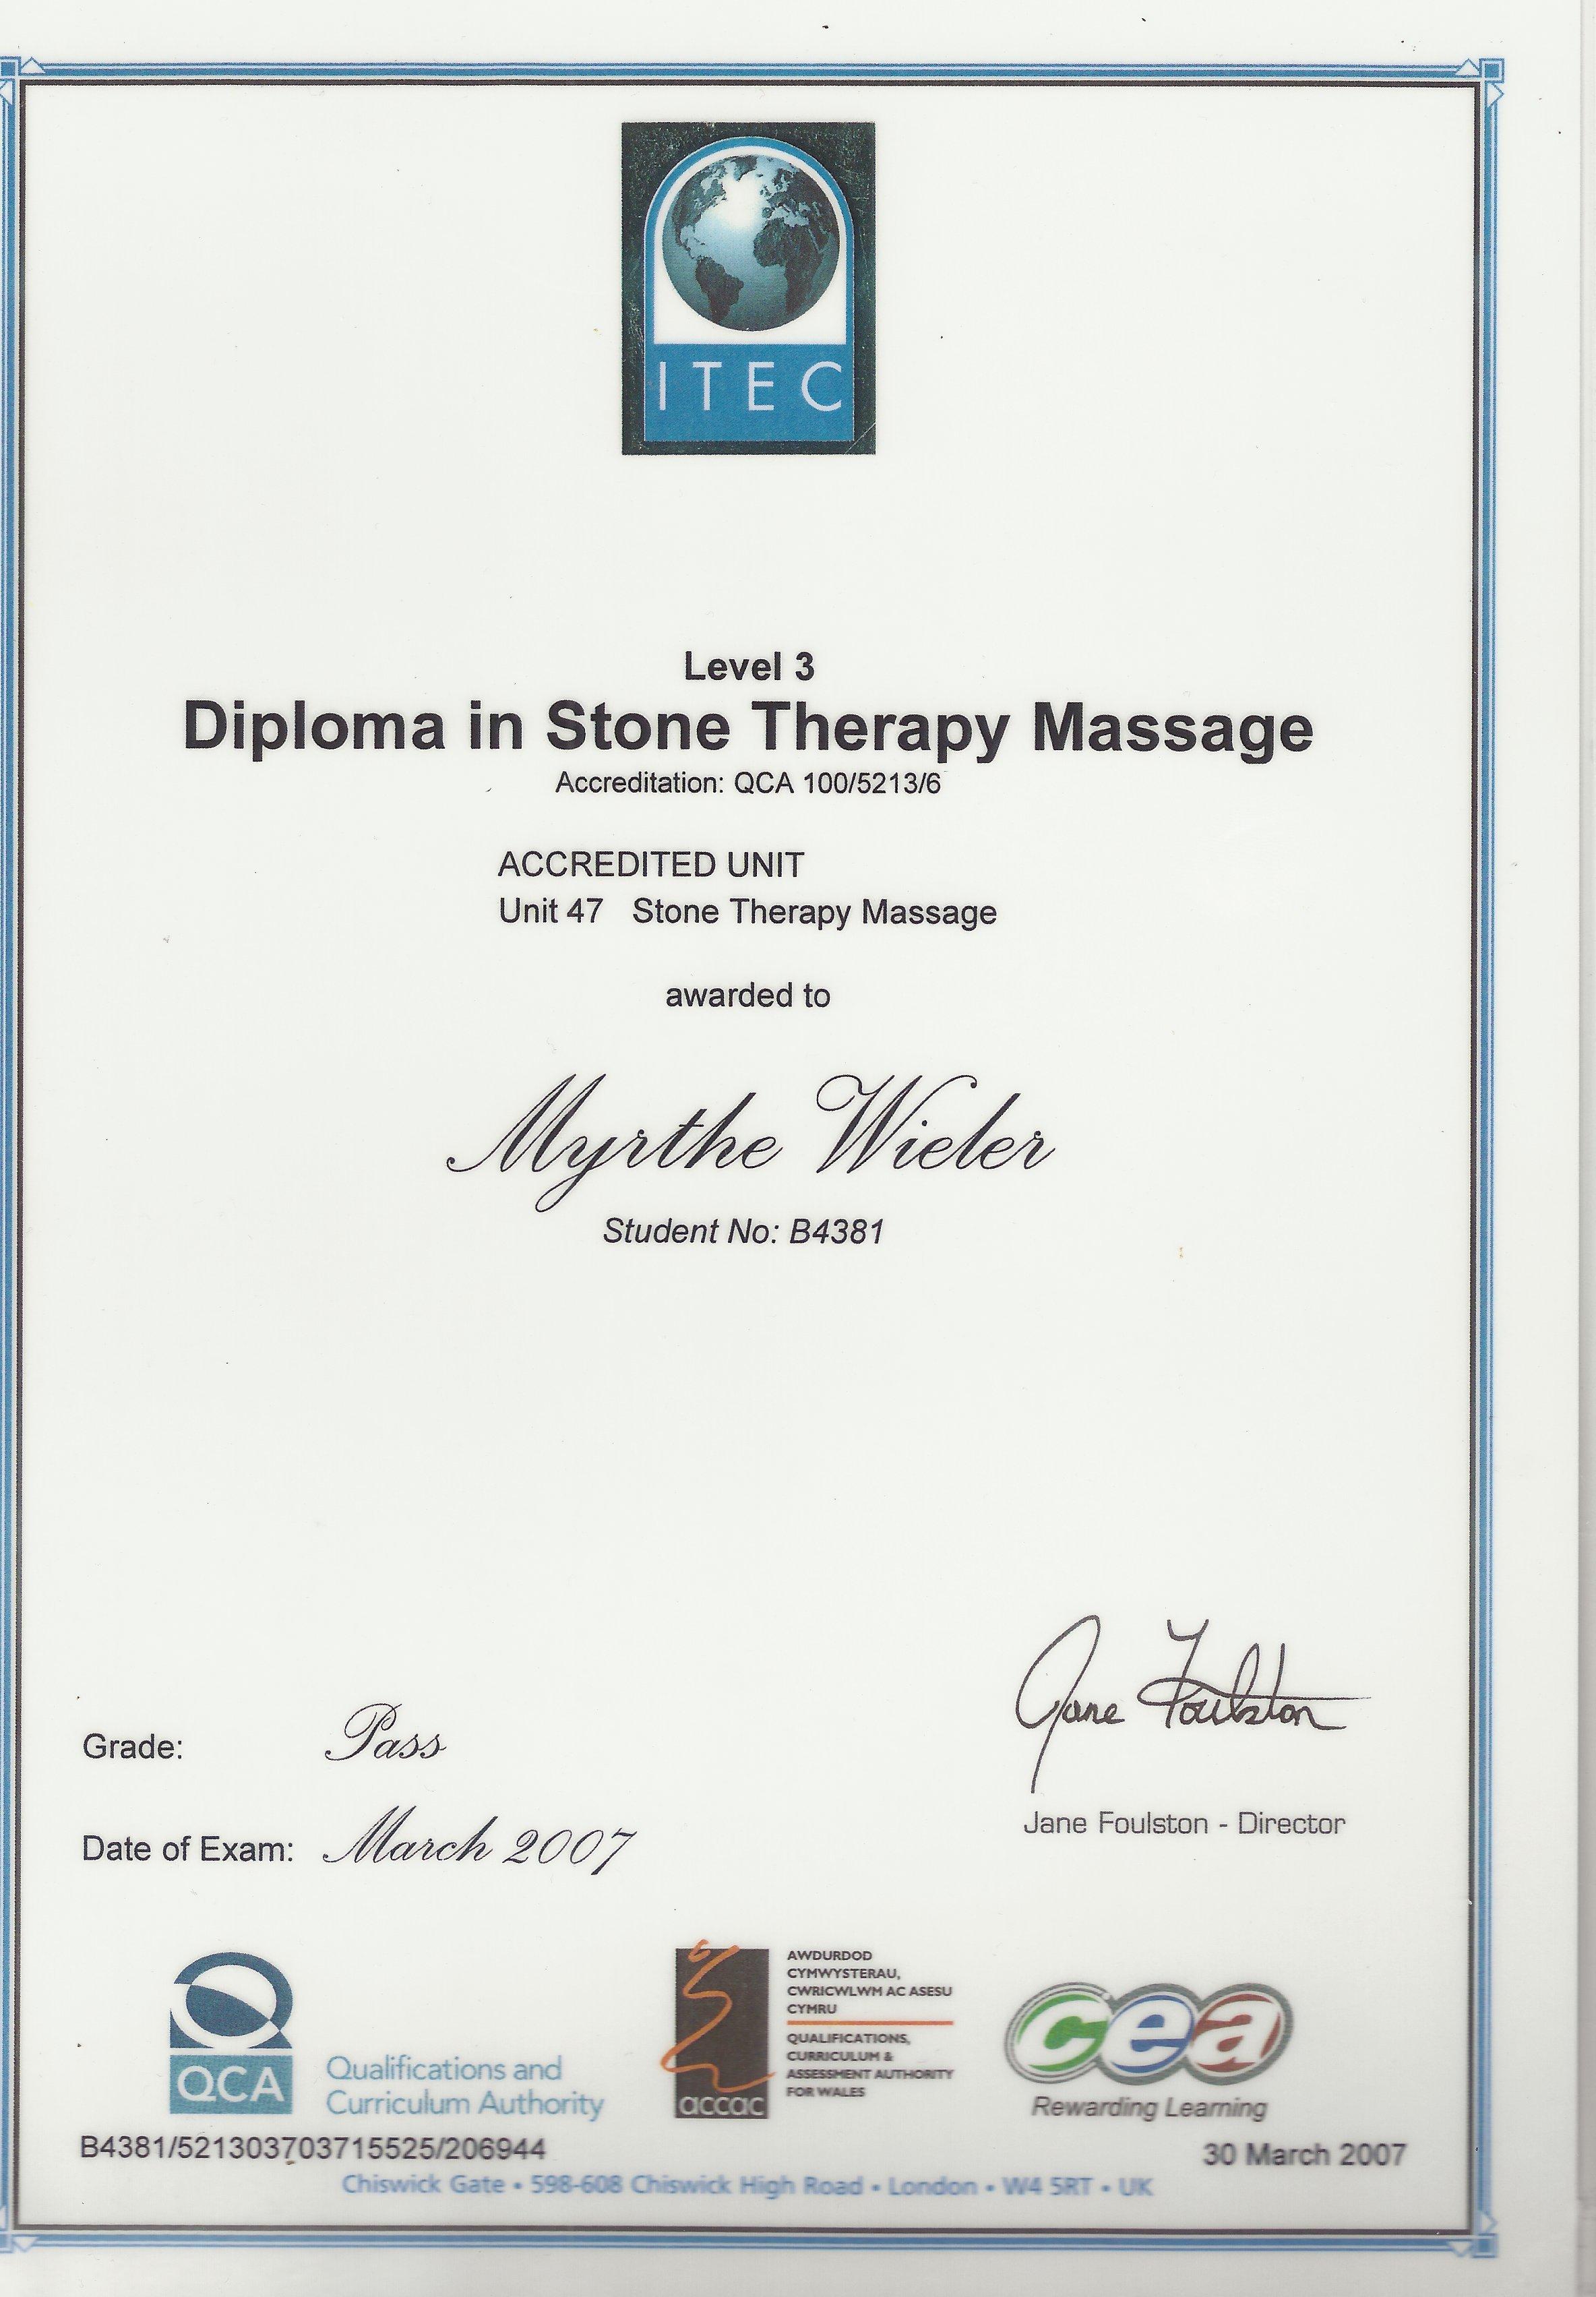 Dip Ston Therapy